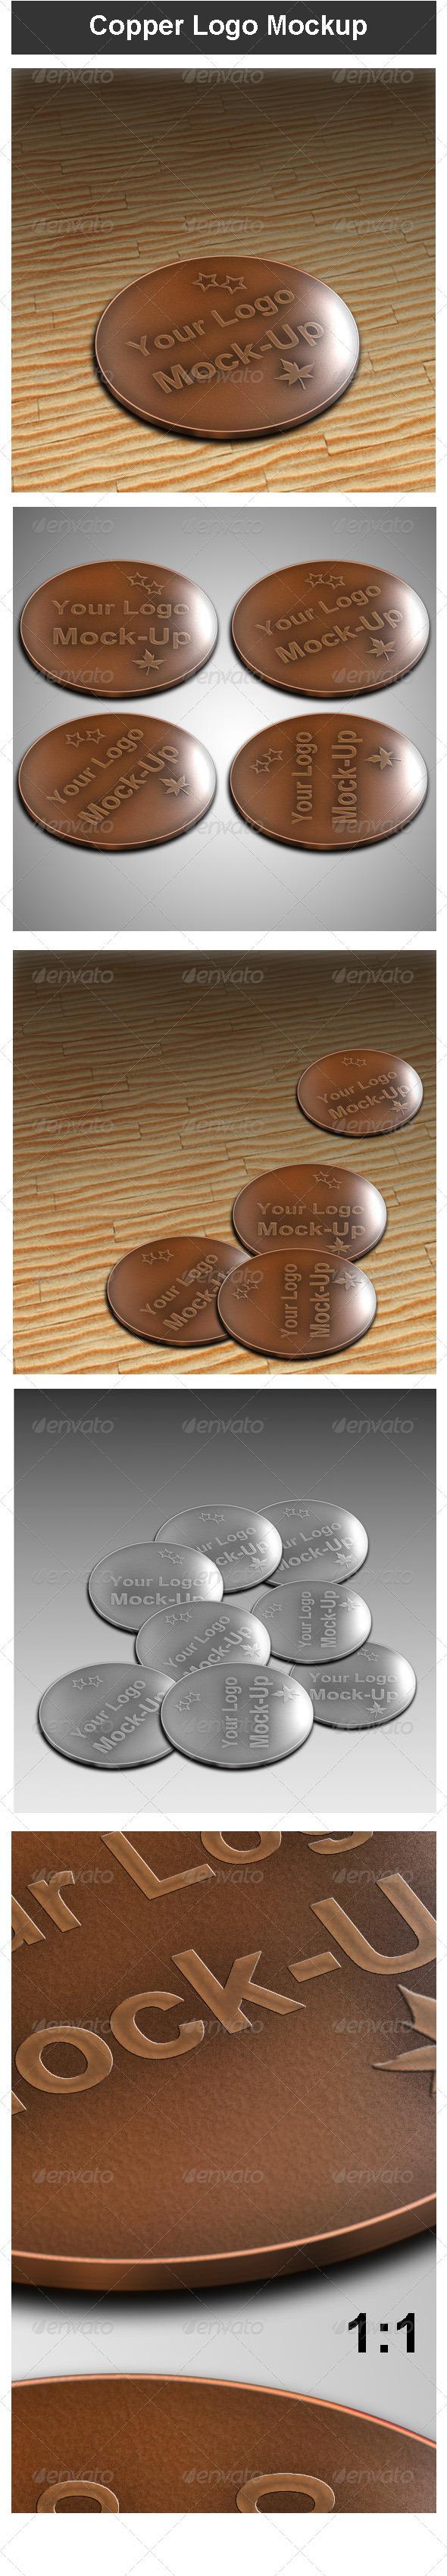 GraphicRiver Copper Logo Mock-up 3643633